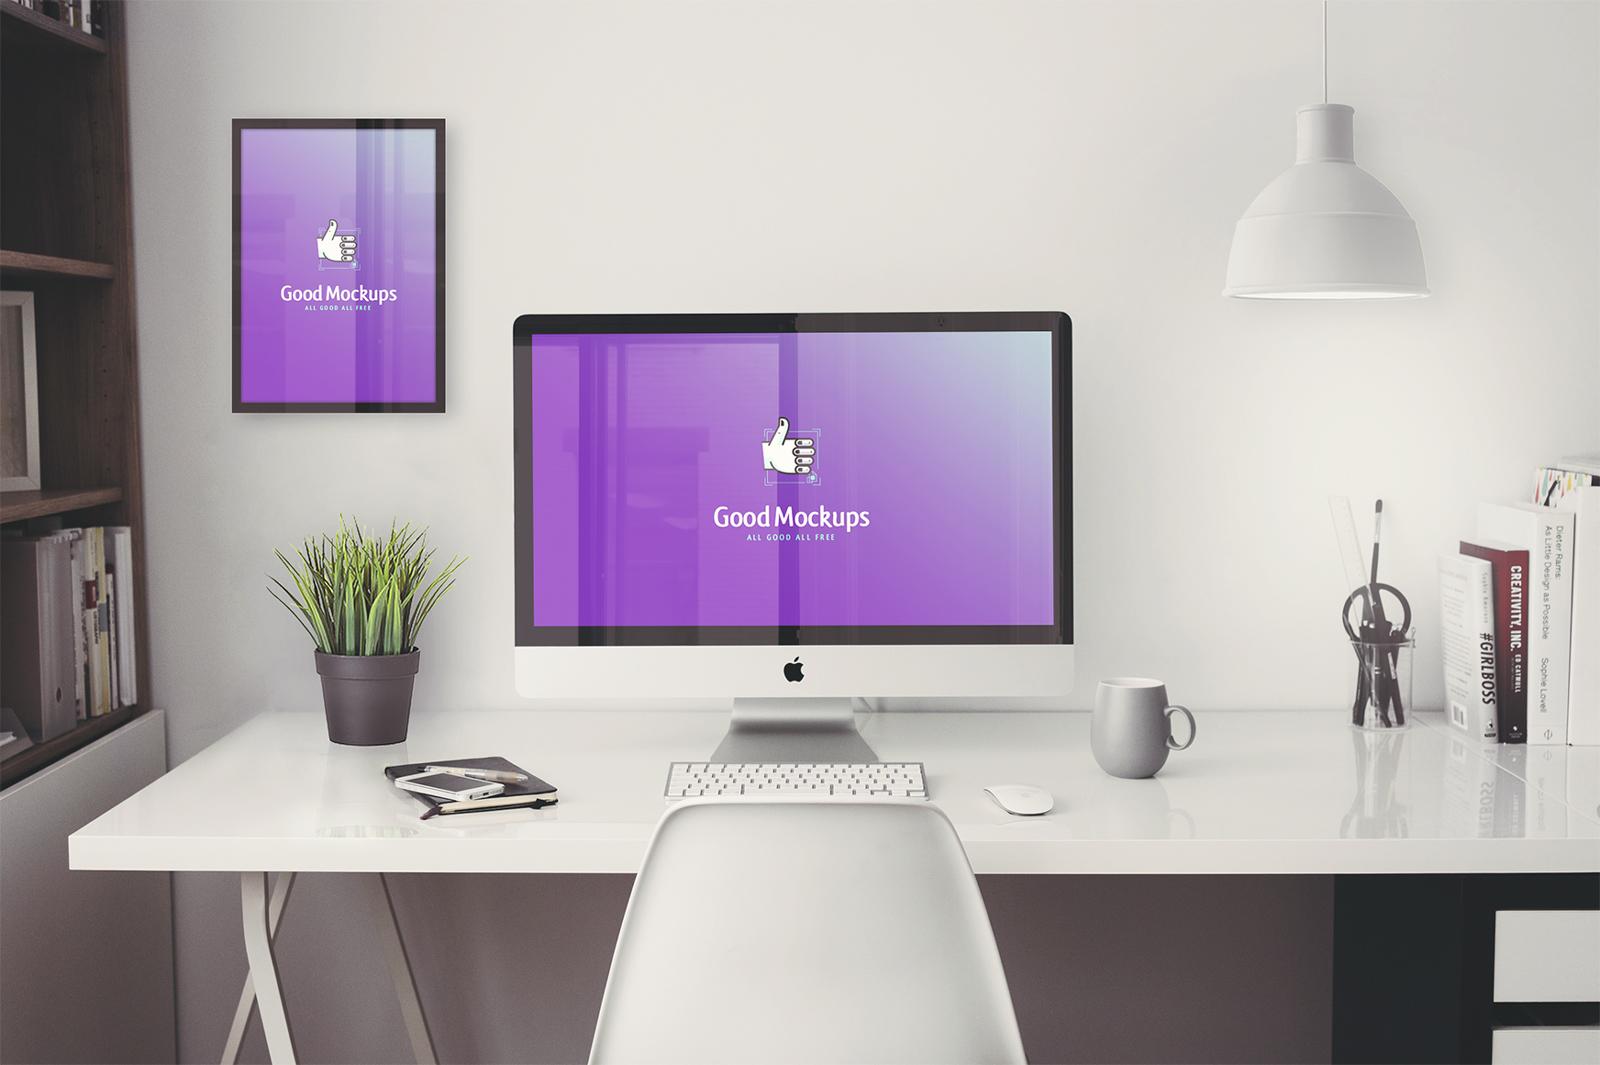 Free-iMac-5k-Office-Workplace-Mockup-PSD-2